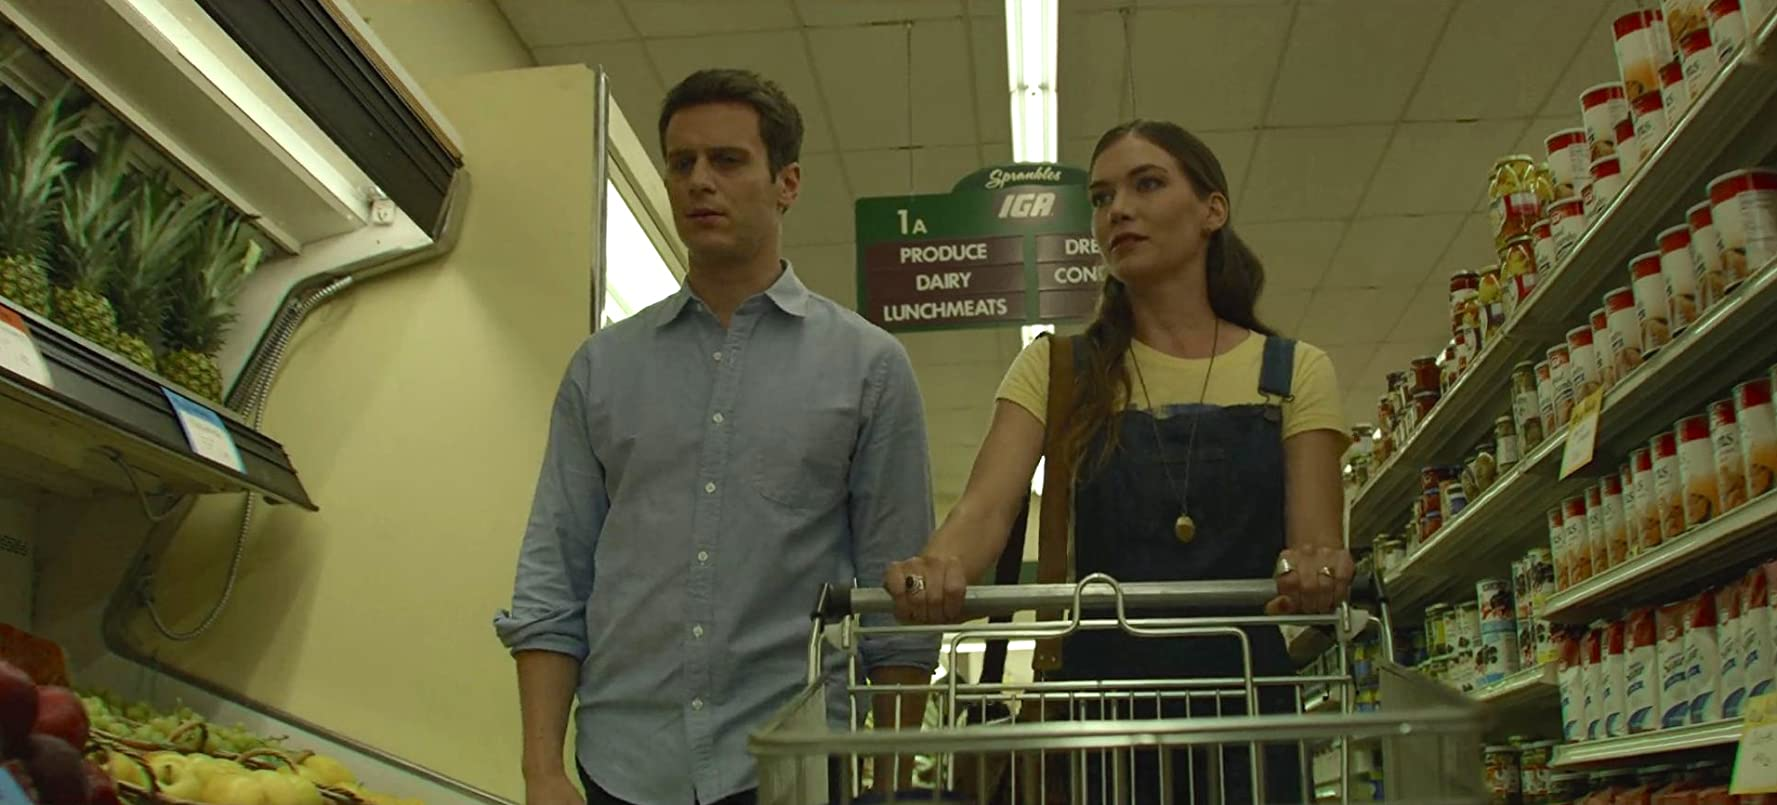 מיינד האנטר עונה 1 - נטפליקס - Mindhunter